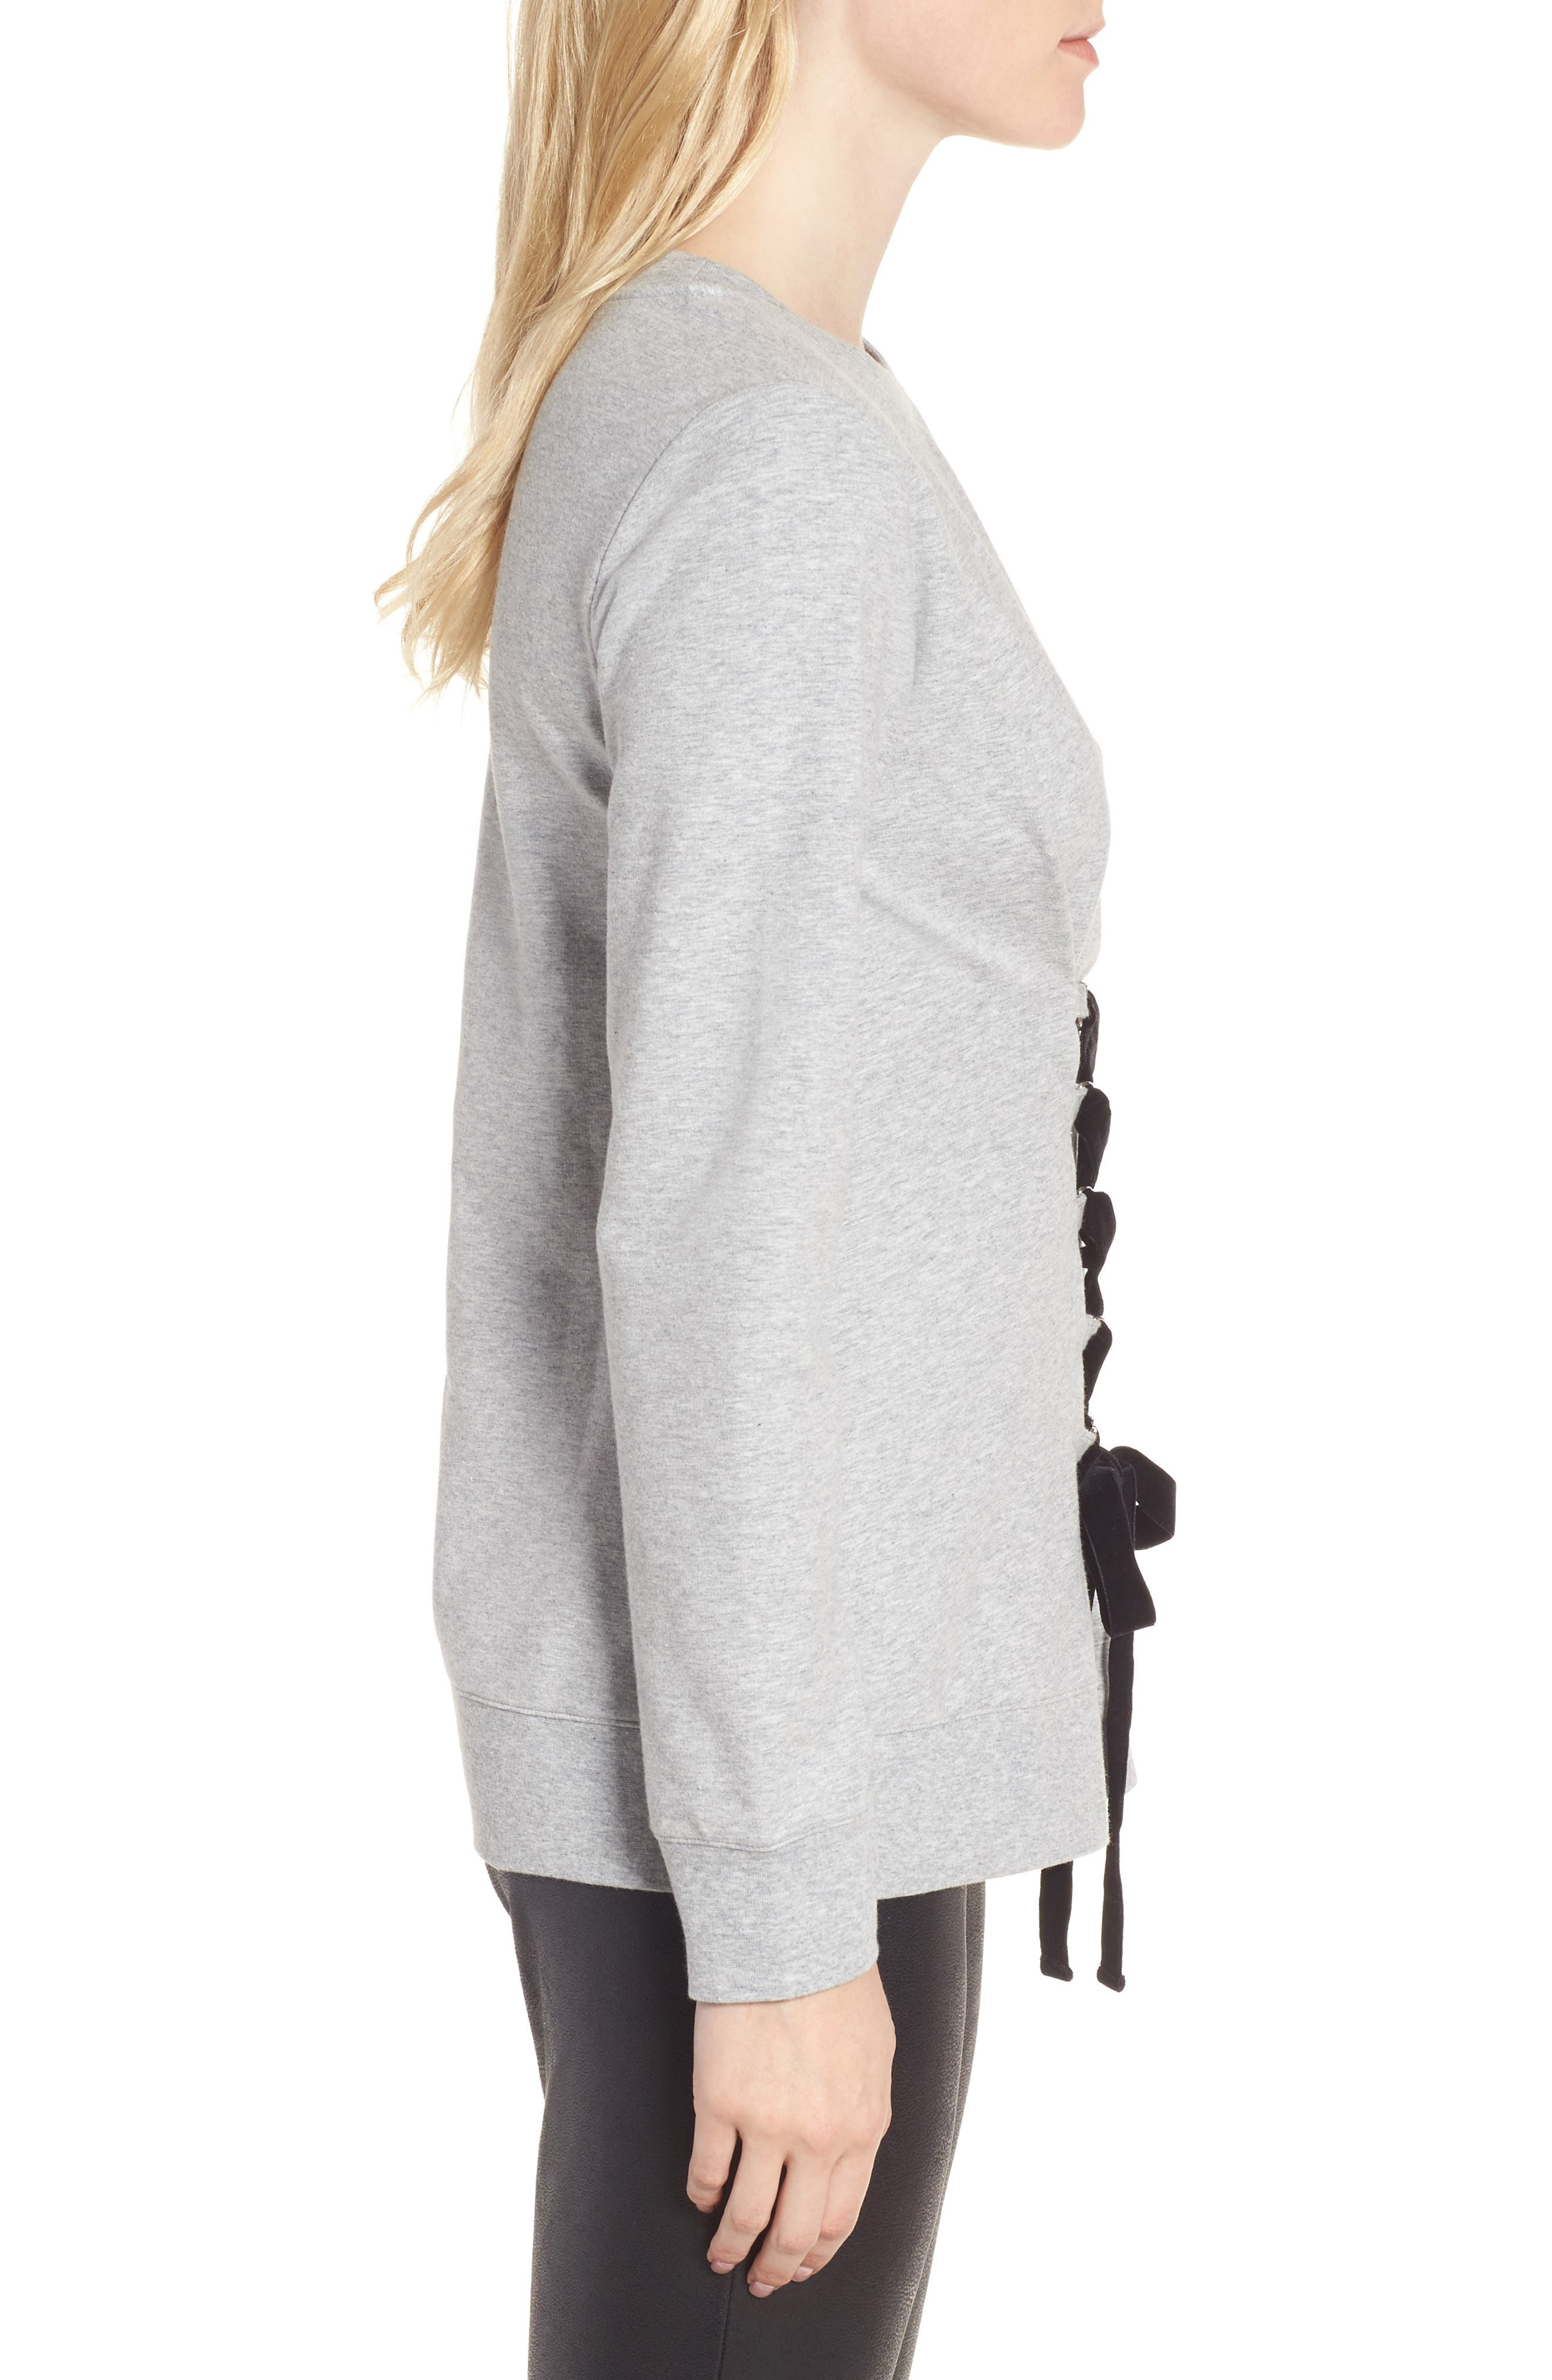 Lace-Up Sweatshirt,                             Alternate thumbnail 3, color,                             Grey Heather